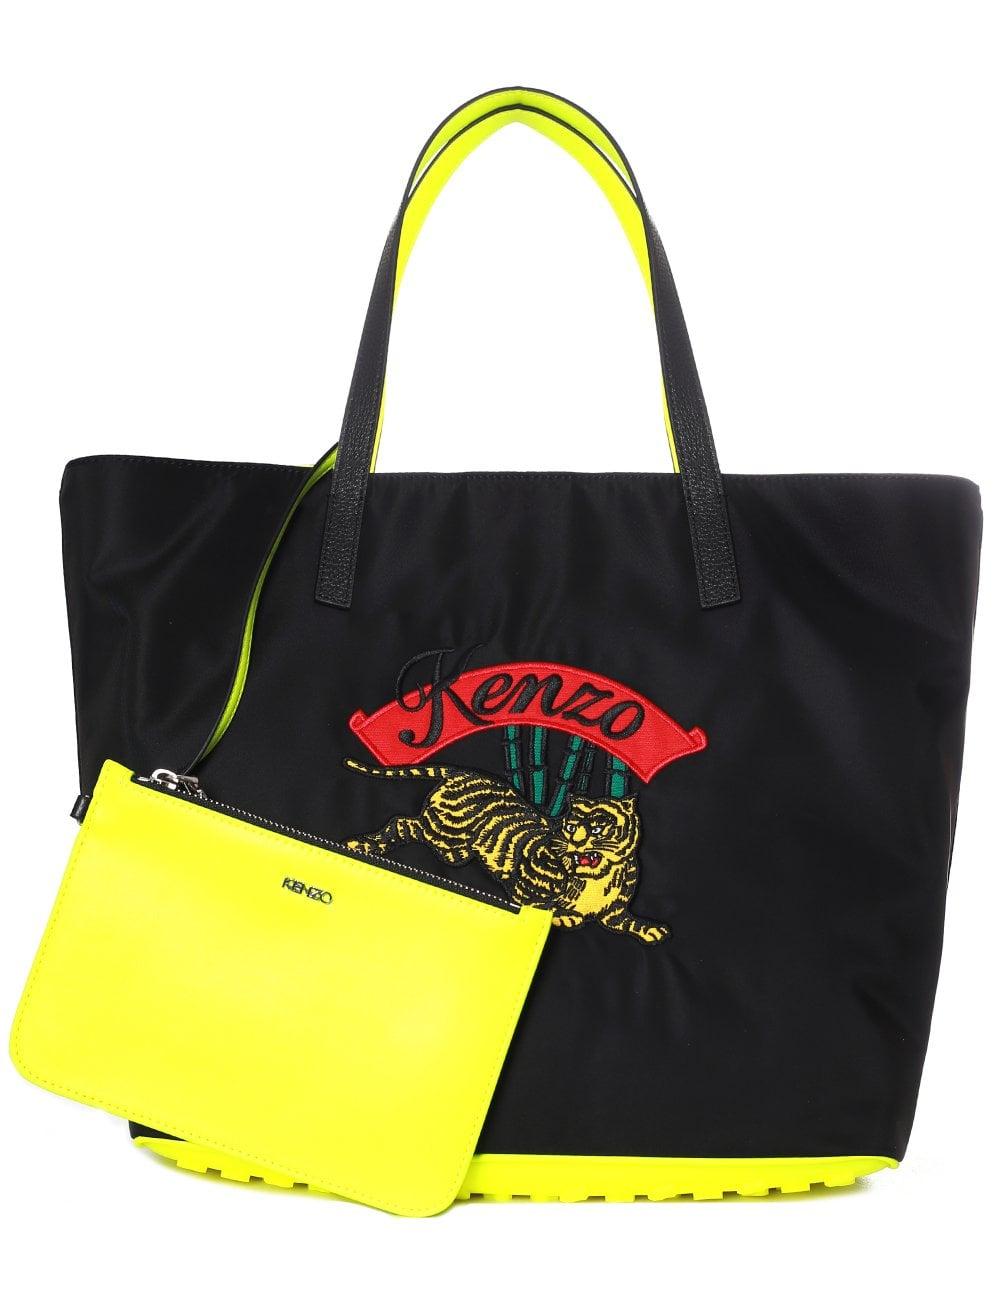 db876b4b03 Kenzo Women's Bamboo Tiger Shoulder Shopper Bag